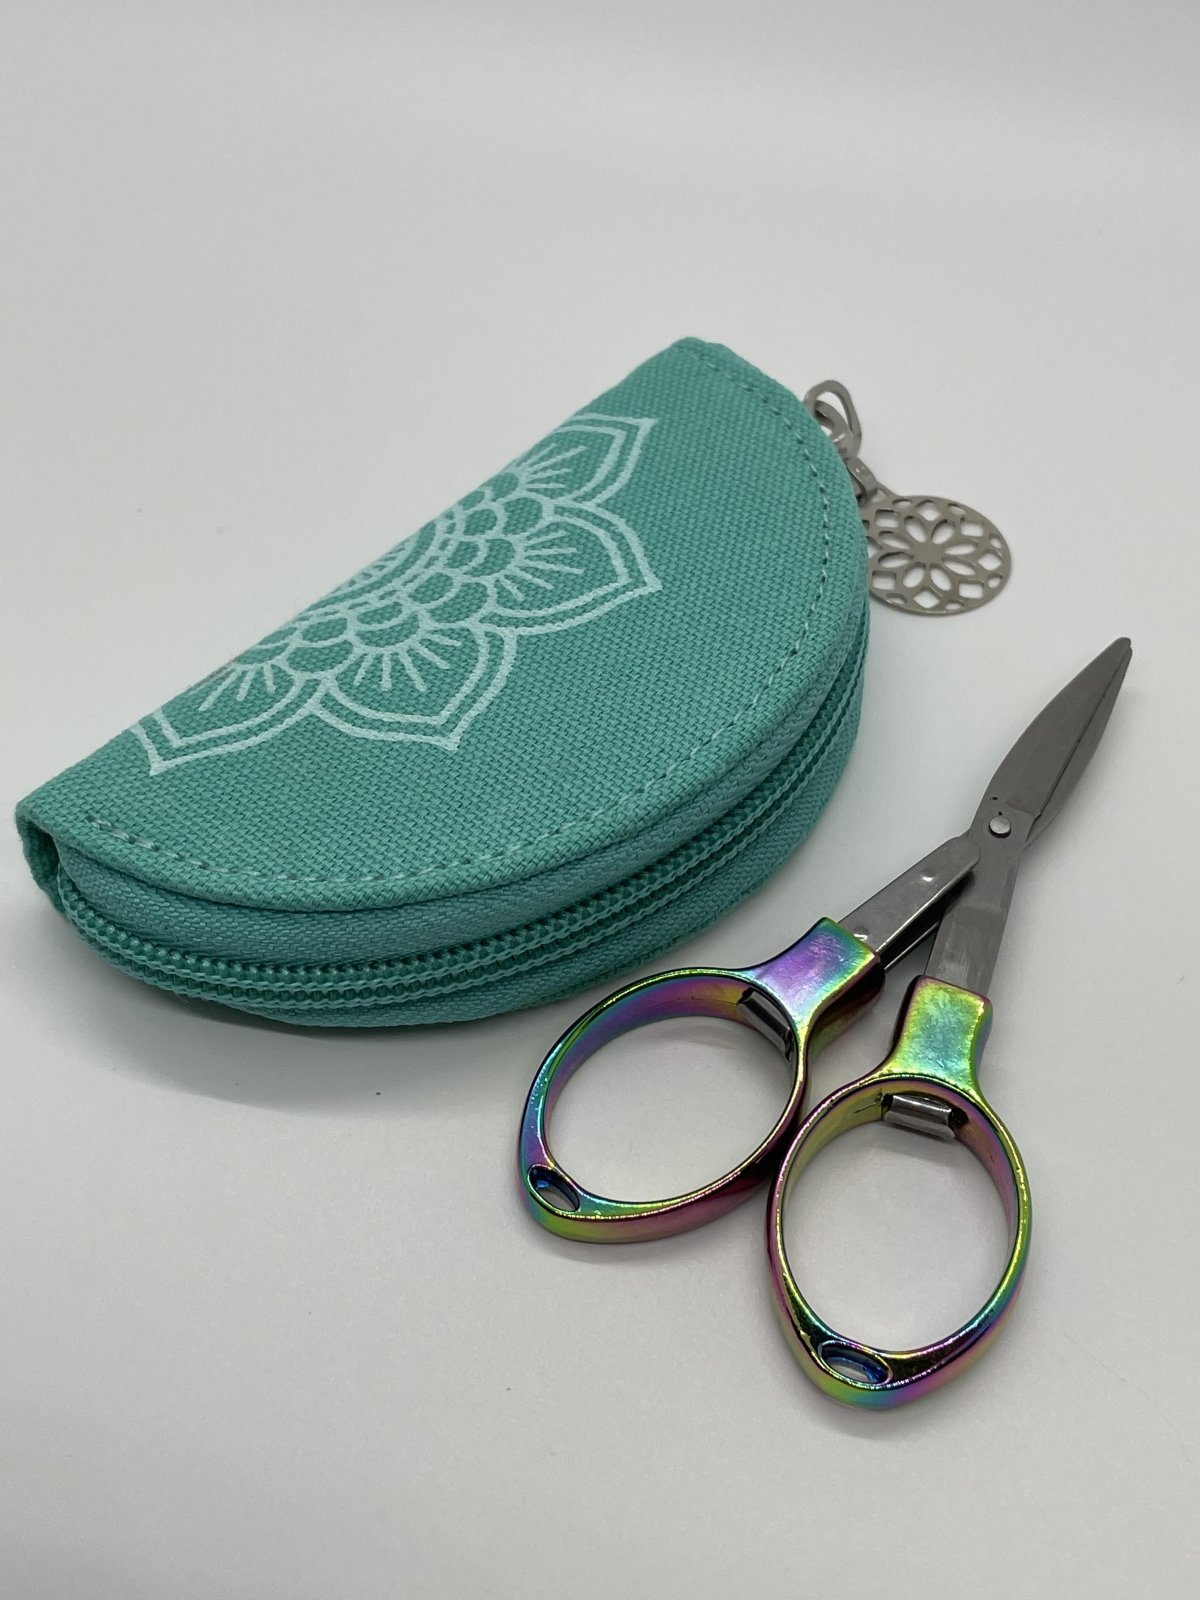 Mindful Folding Scissors